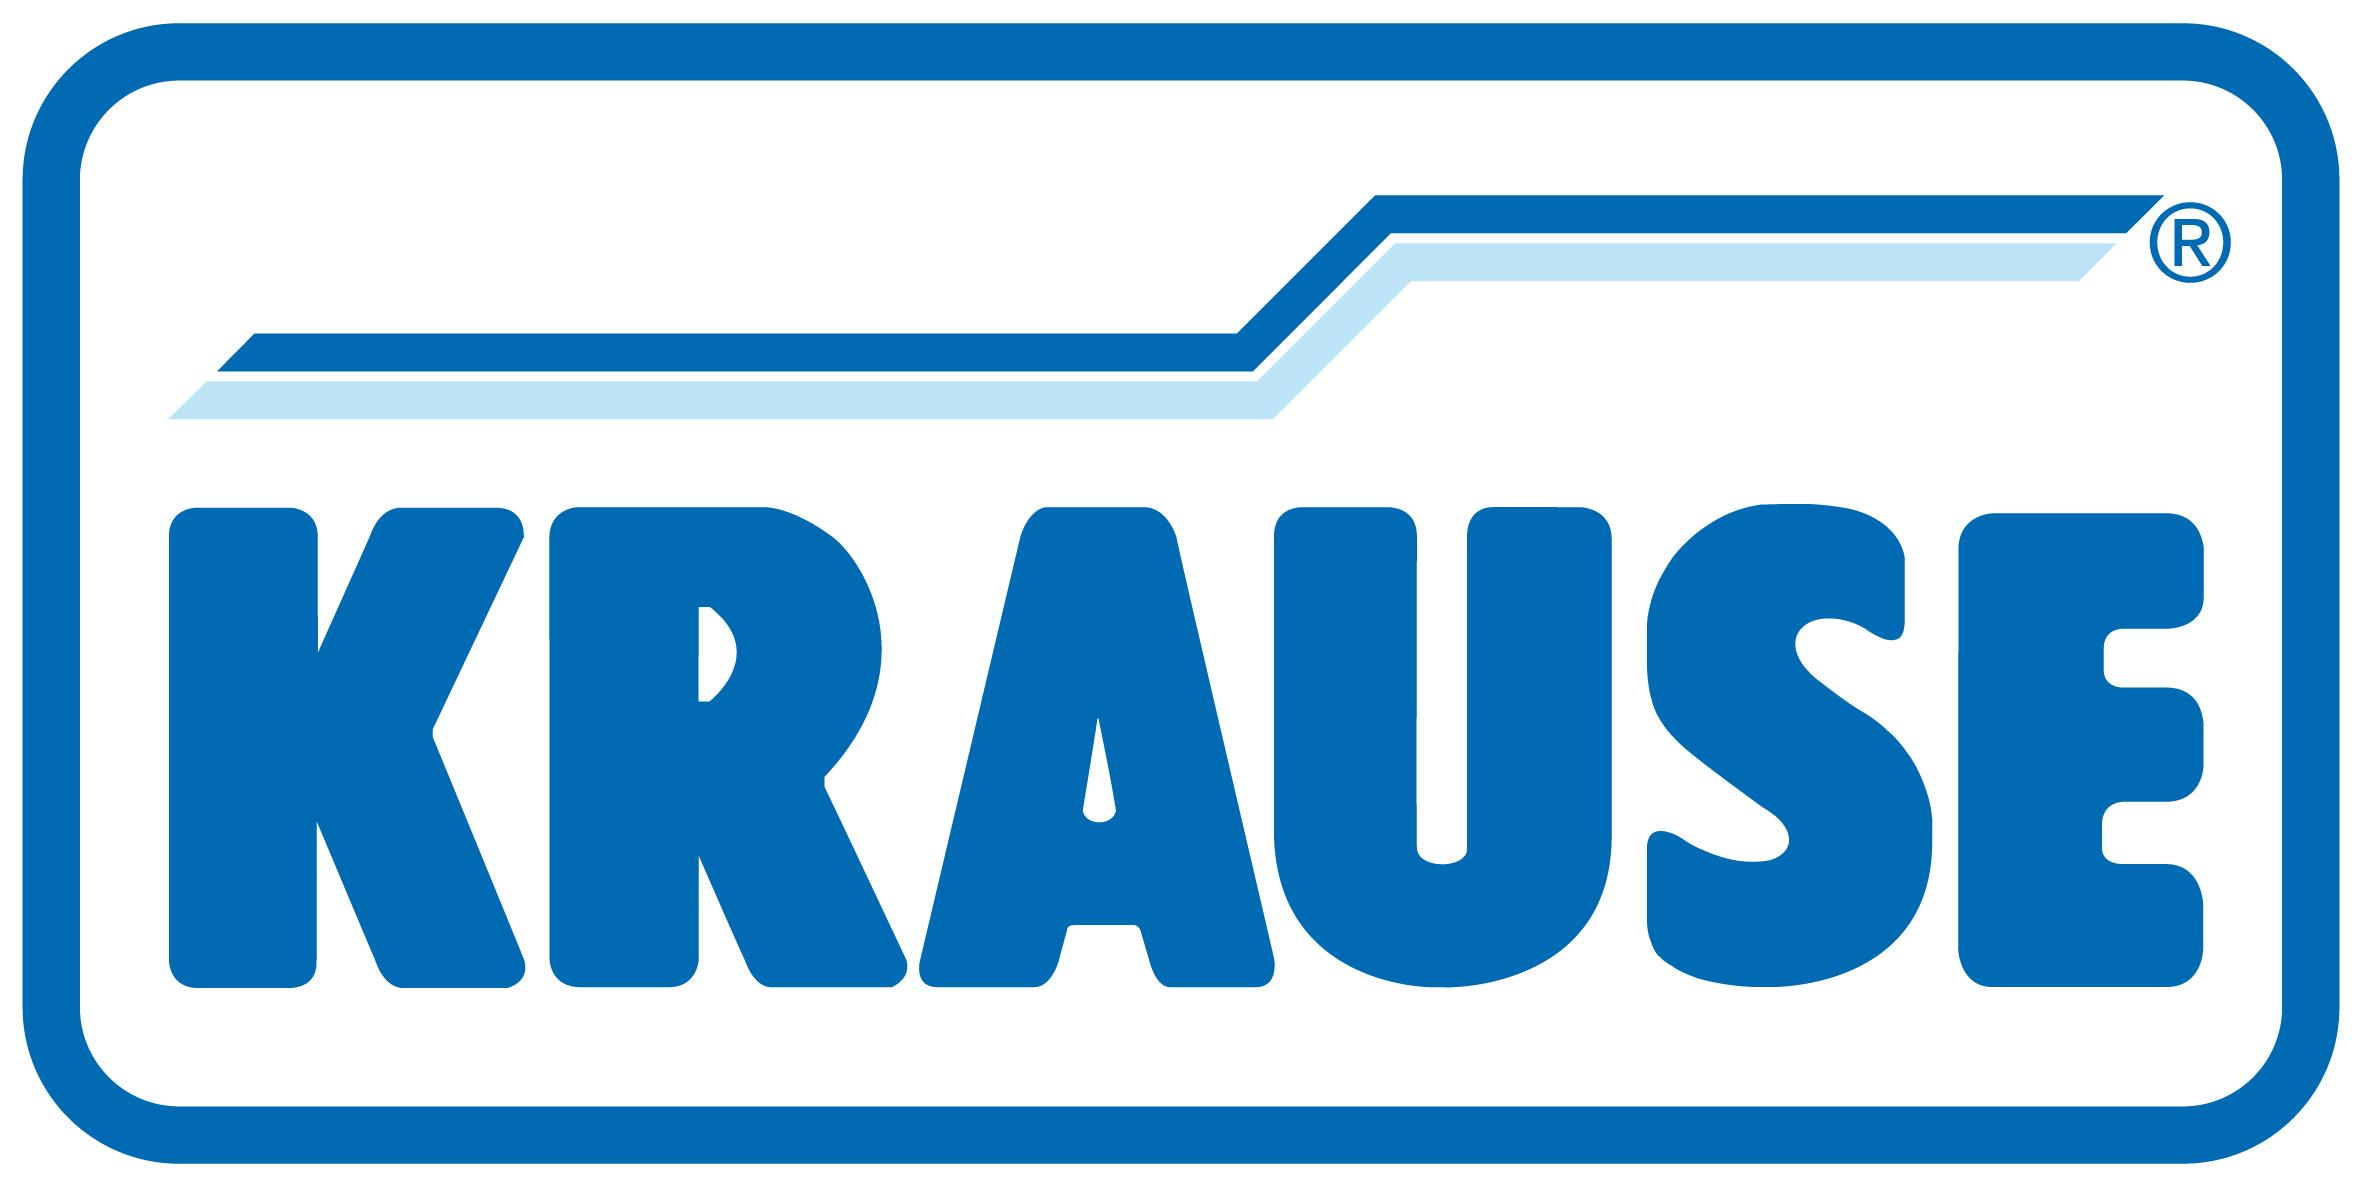 KRAUSE Logo HKS44 m Umrandung-pfad